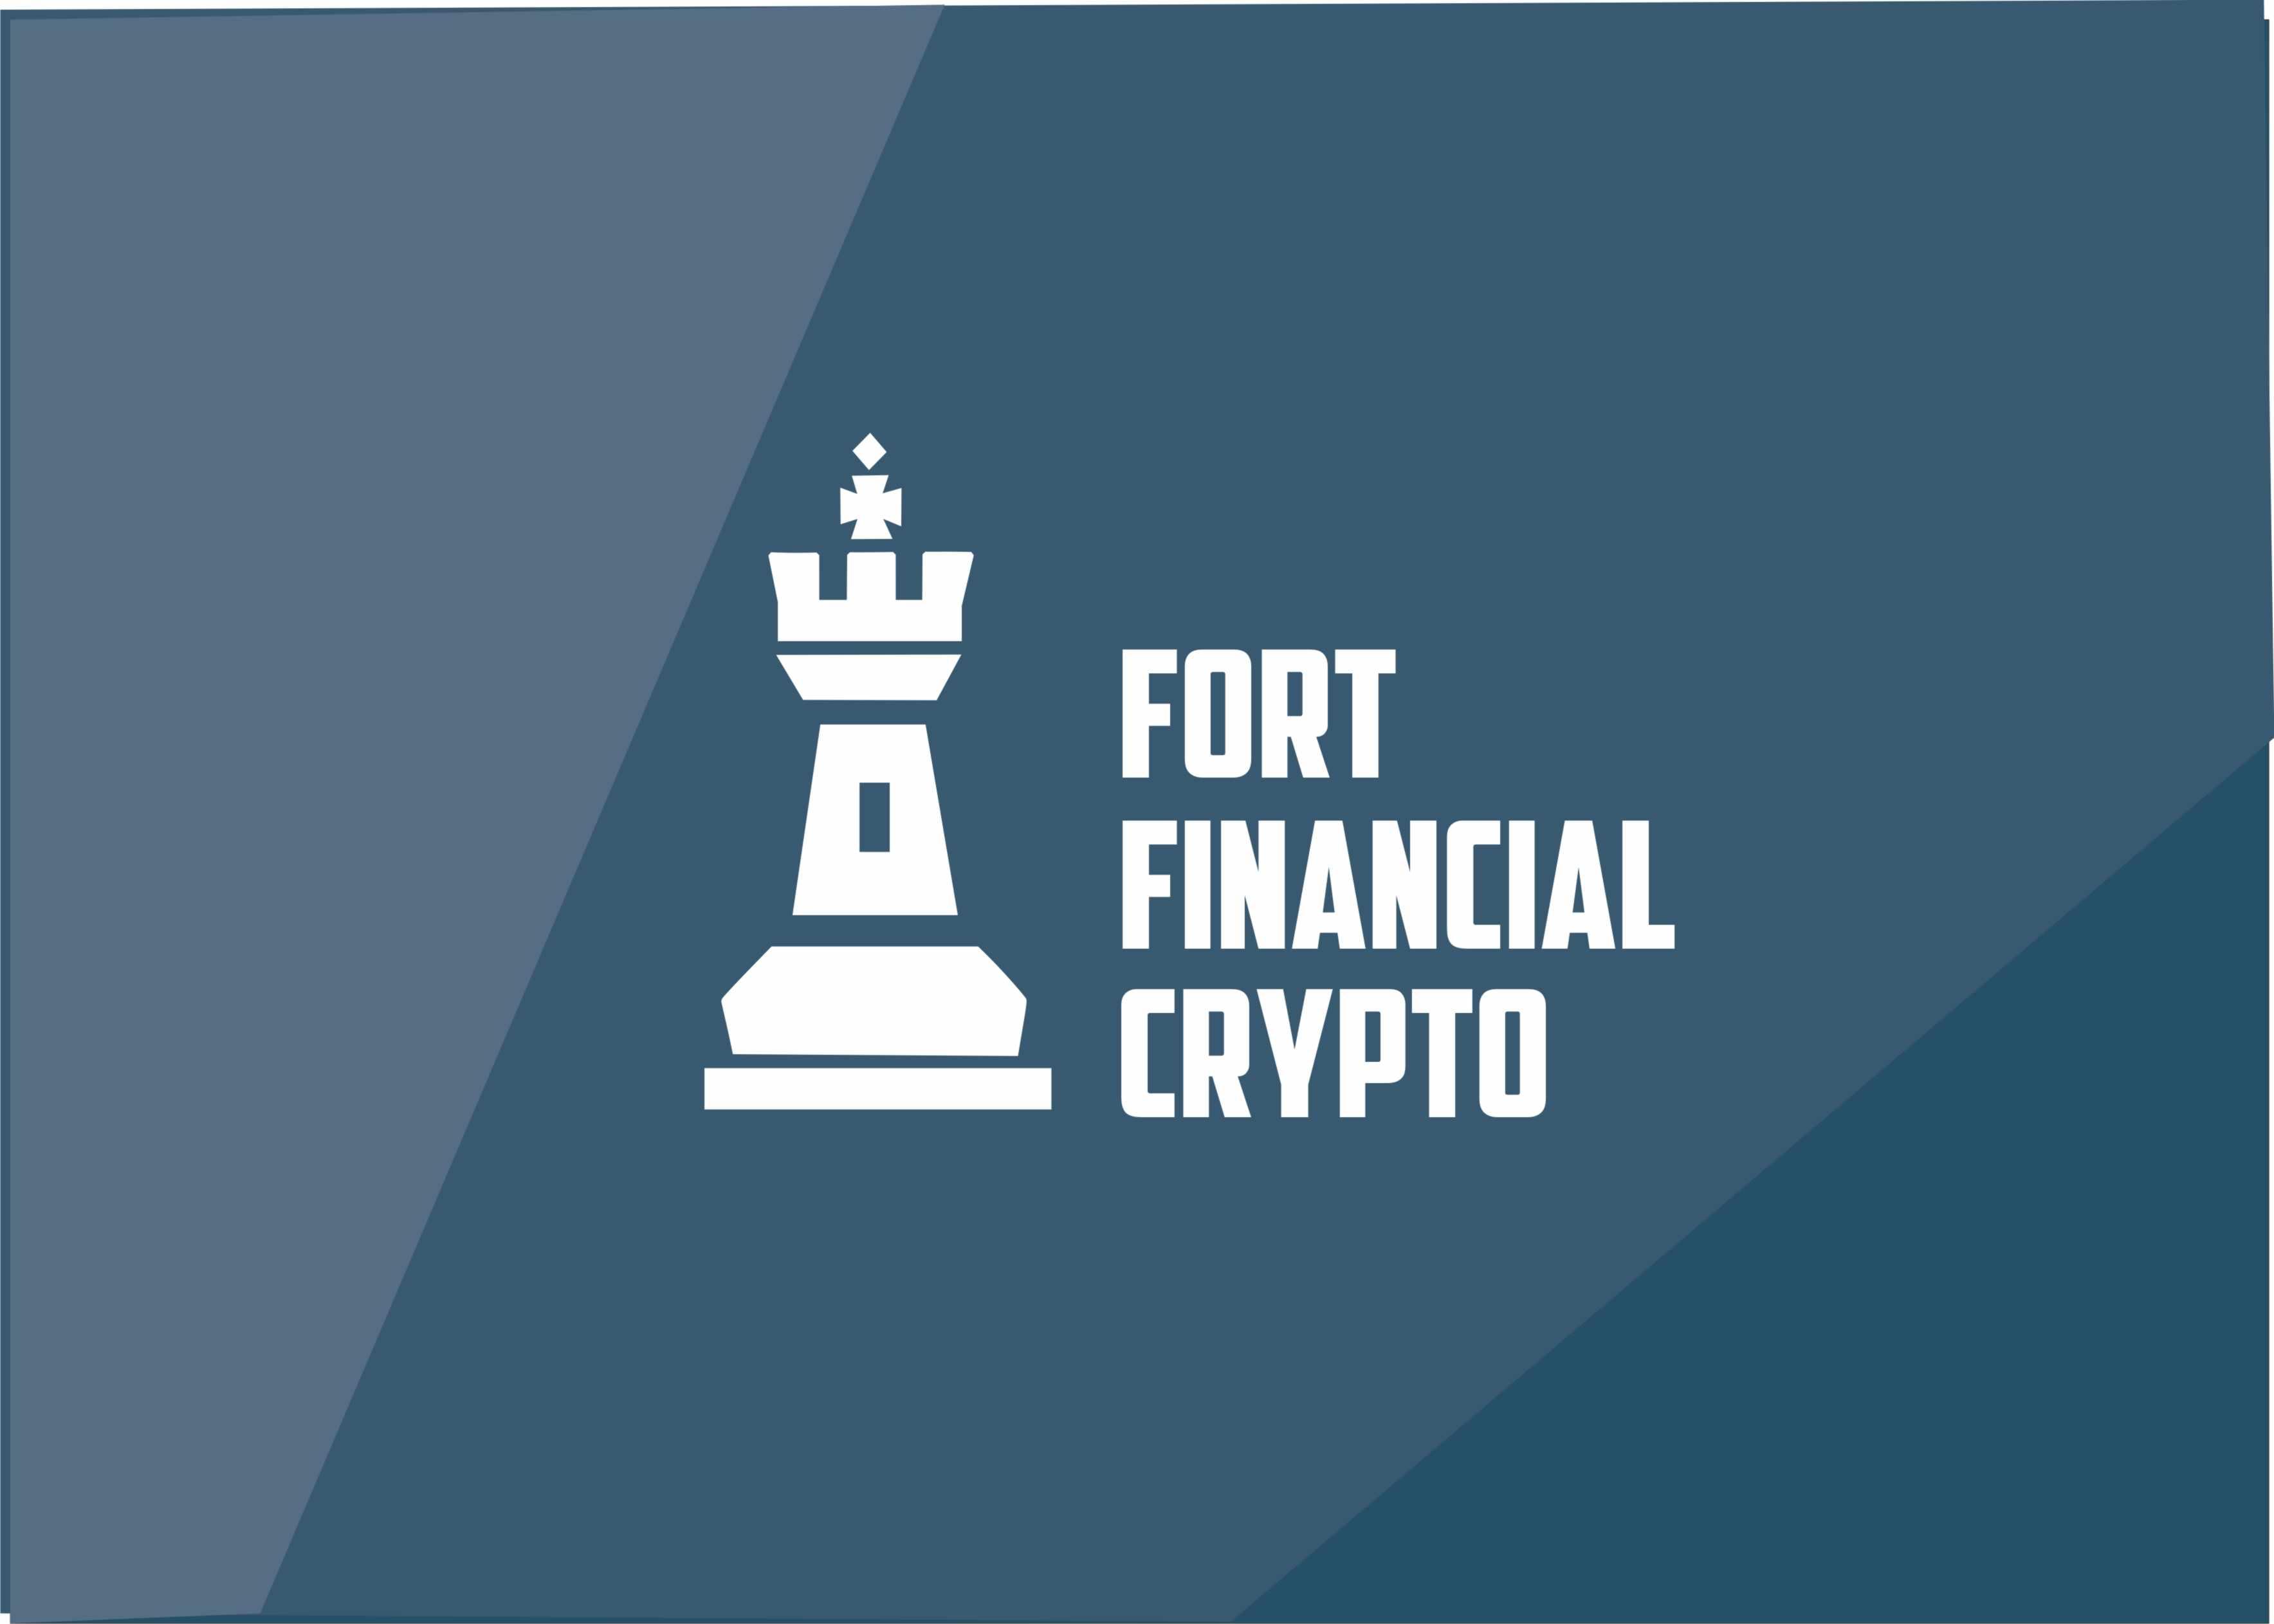 Разработка логотипа финансовой компании фото f_0095a86f5a591449.jpg